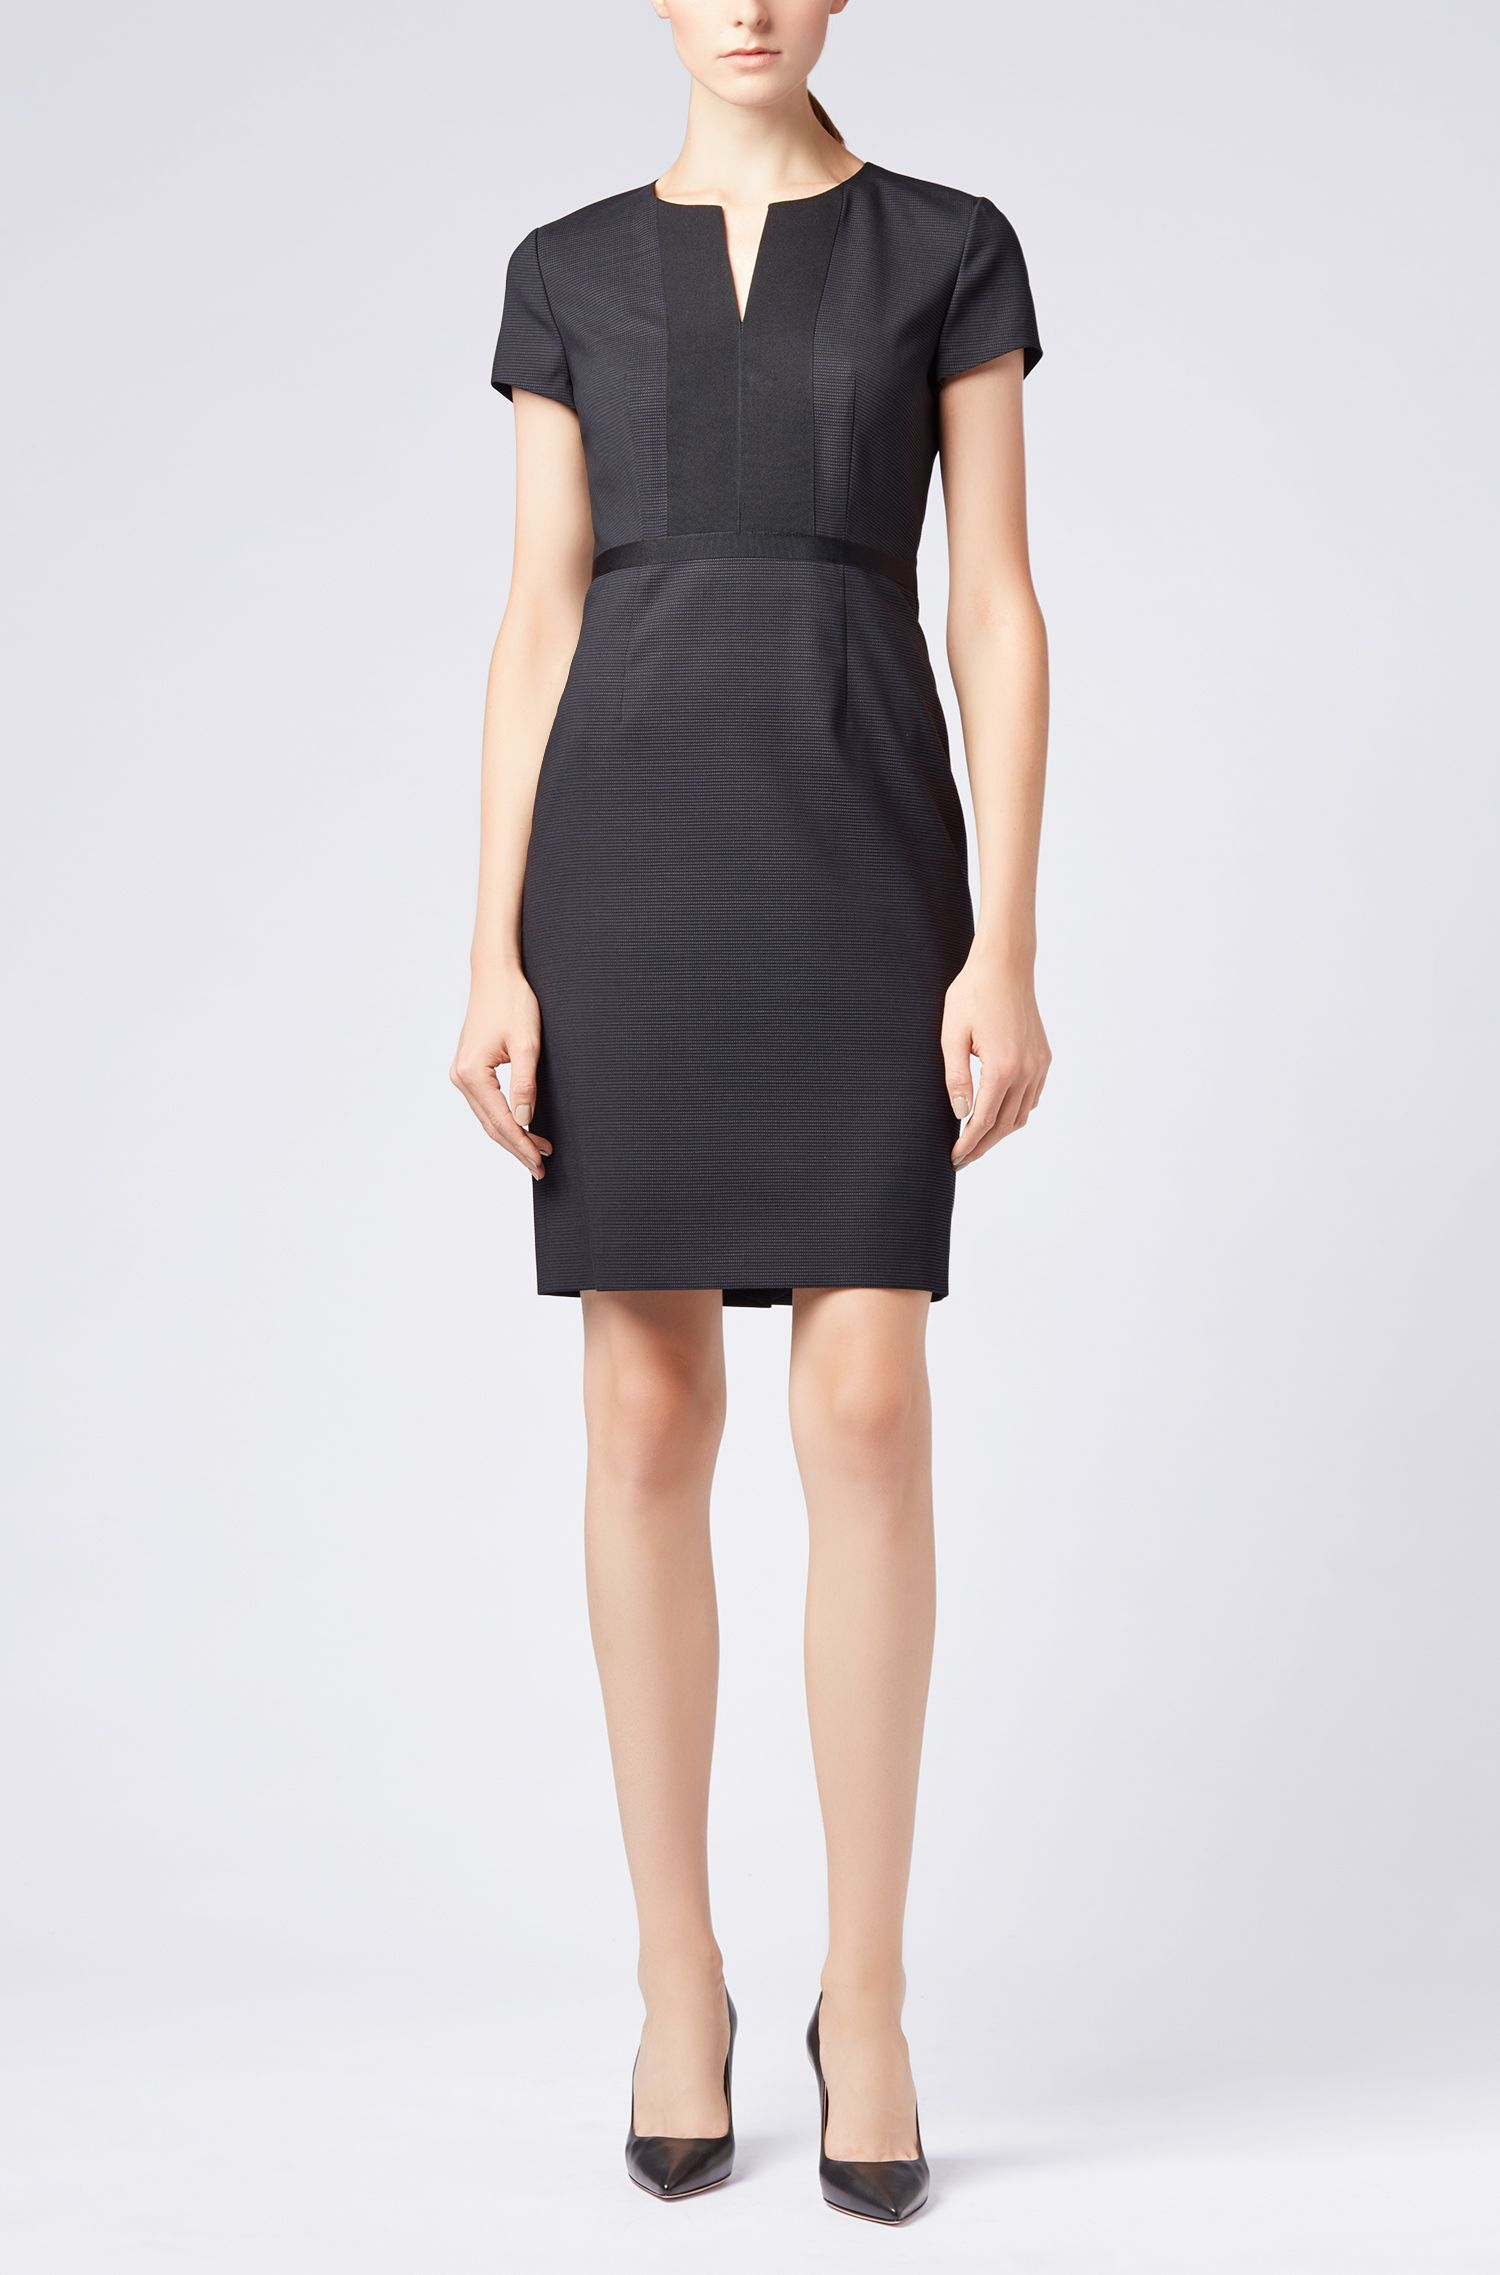 Shift dress in Italian stretch wool with notch neckline, Patterned